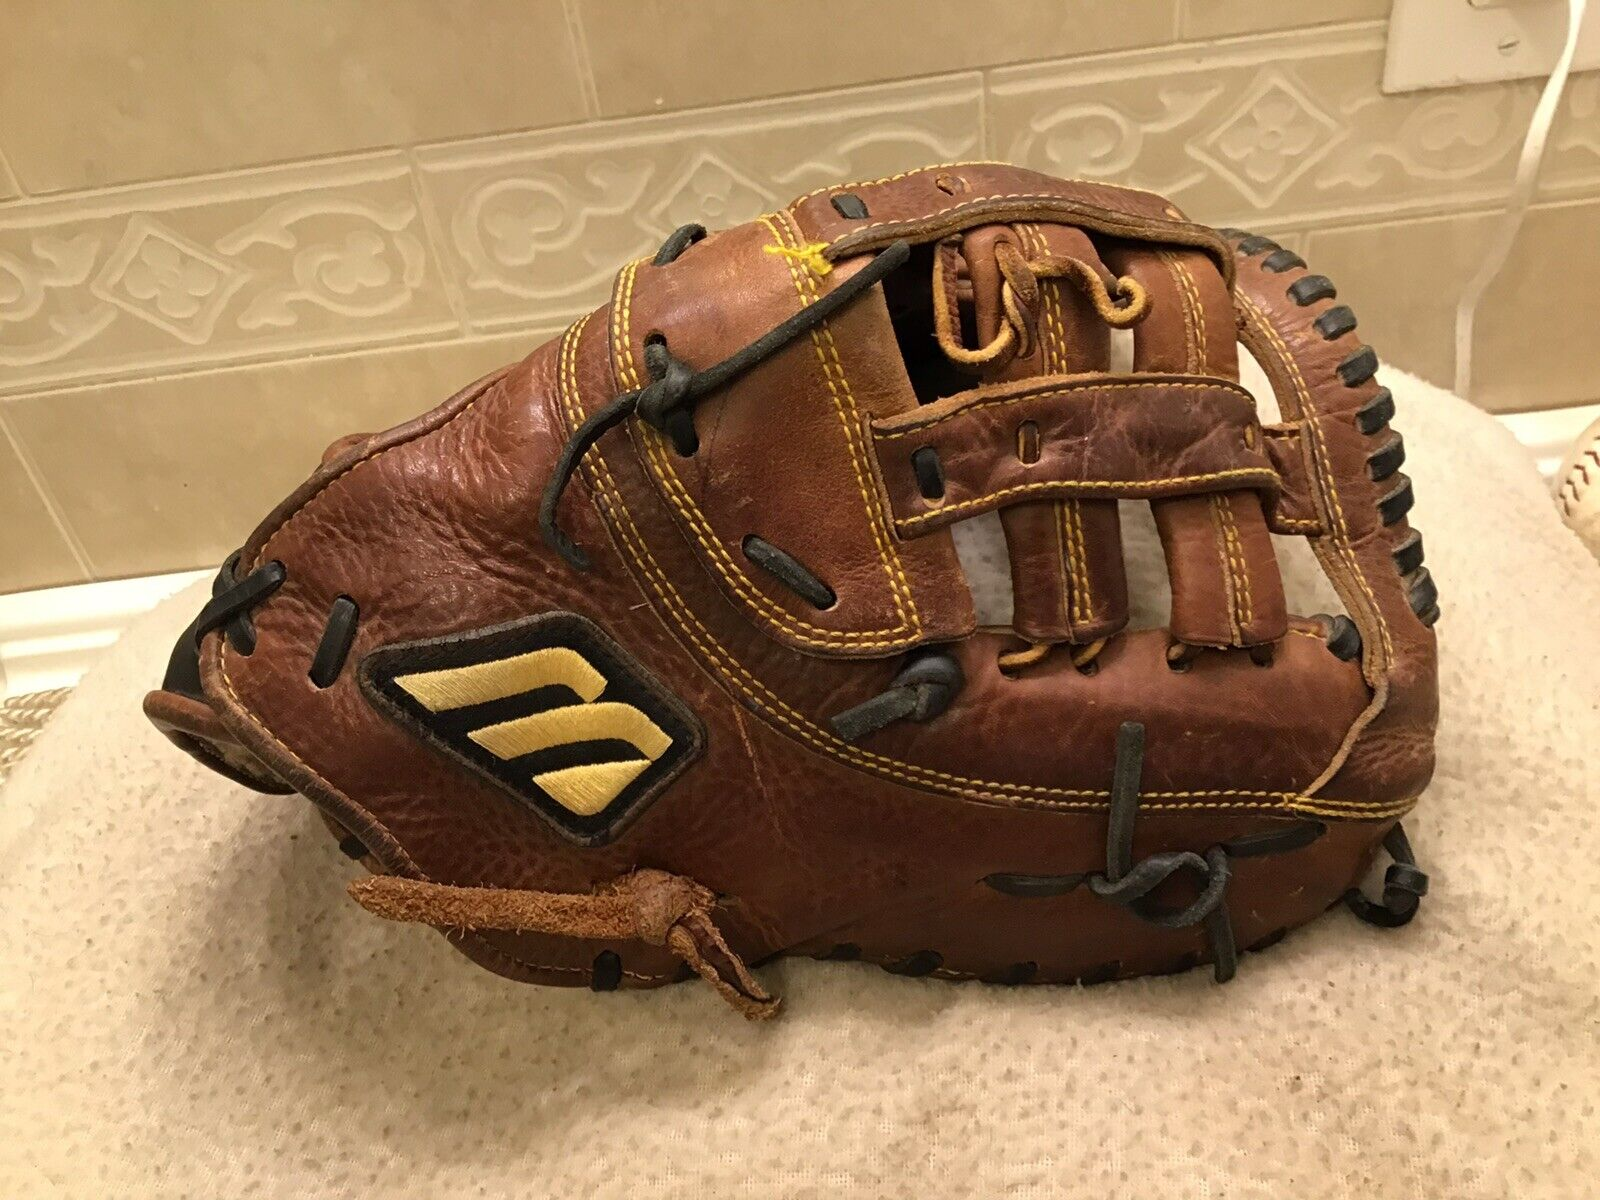 Mizuno MCL 3001 12.75 béisbol Softbol First Base Mitt Tiro Mano derecha